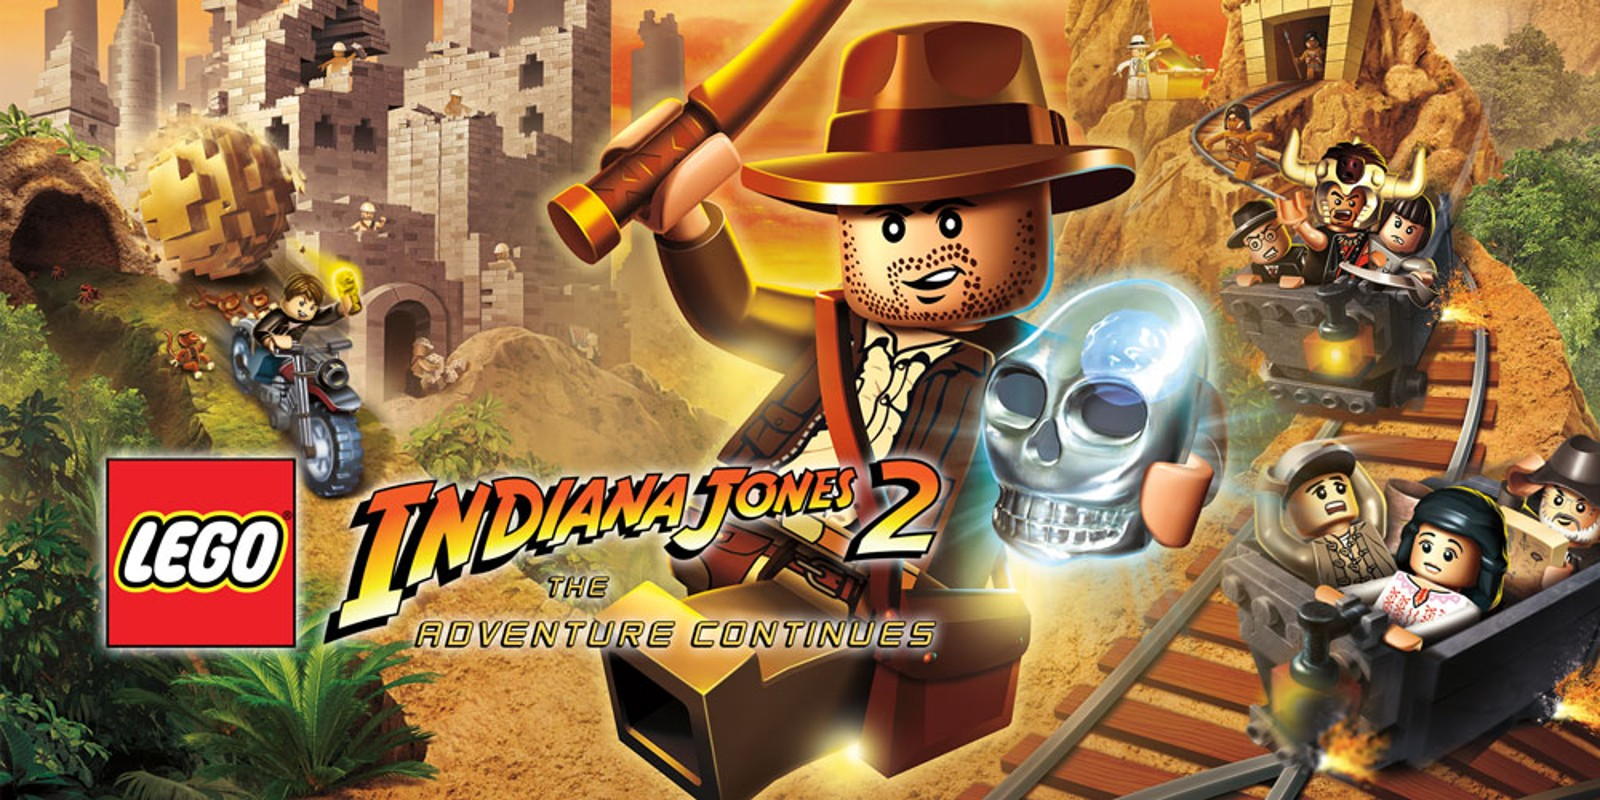 Vos jeux finis en 2018 - Page 23 SI_Wii_LegoIndianaJones2_enGB_image1600w